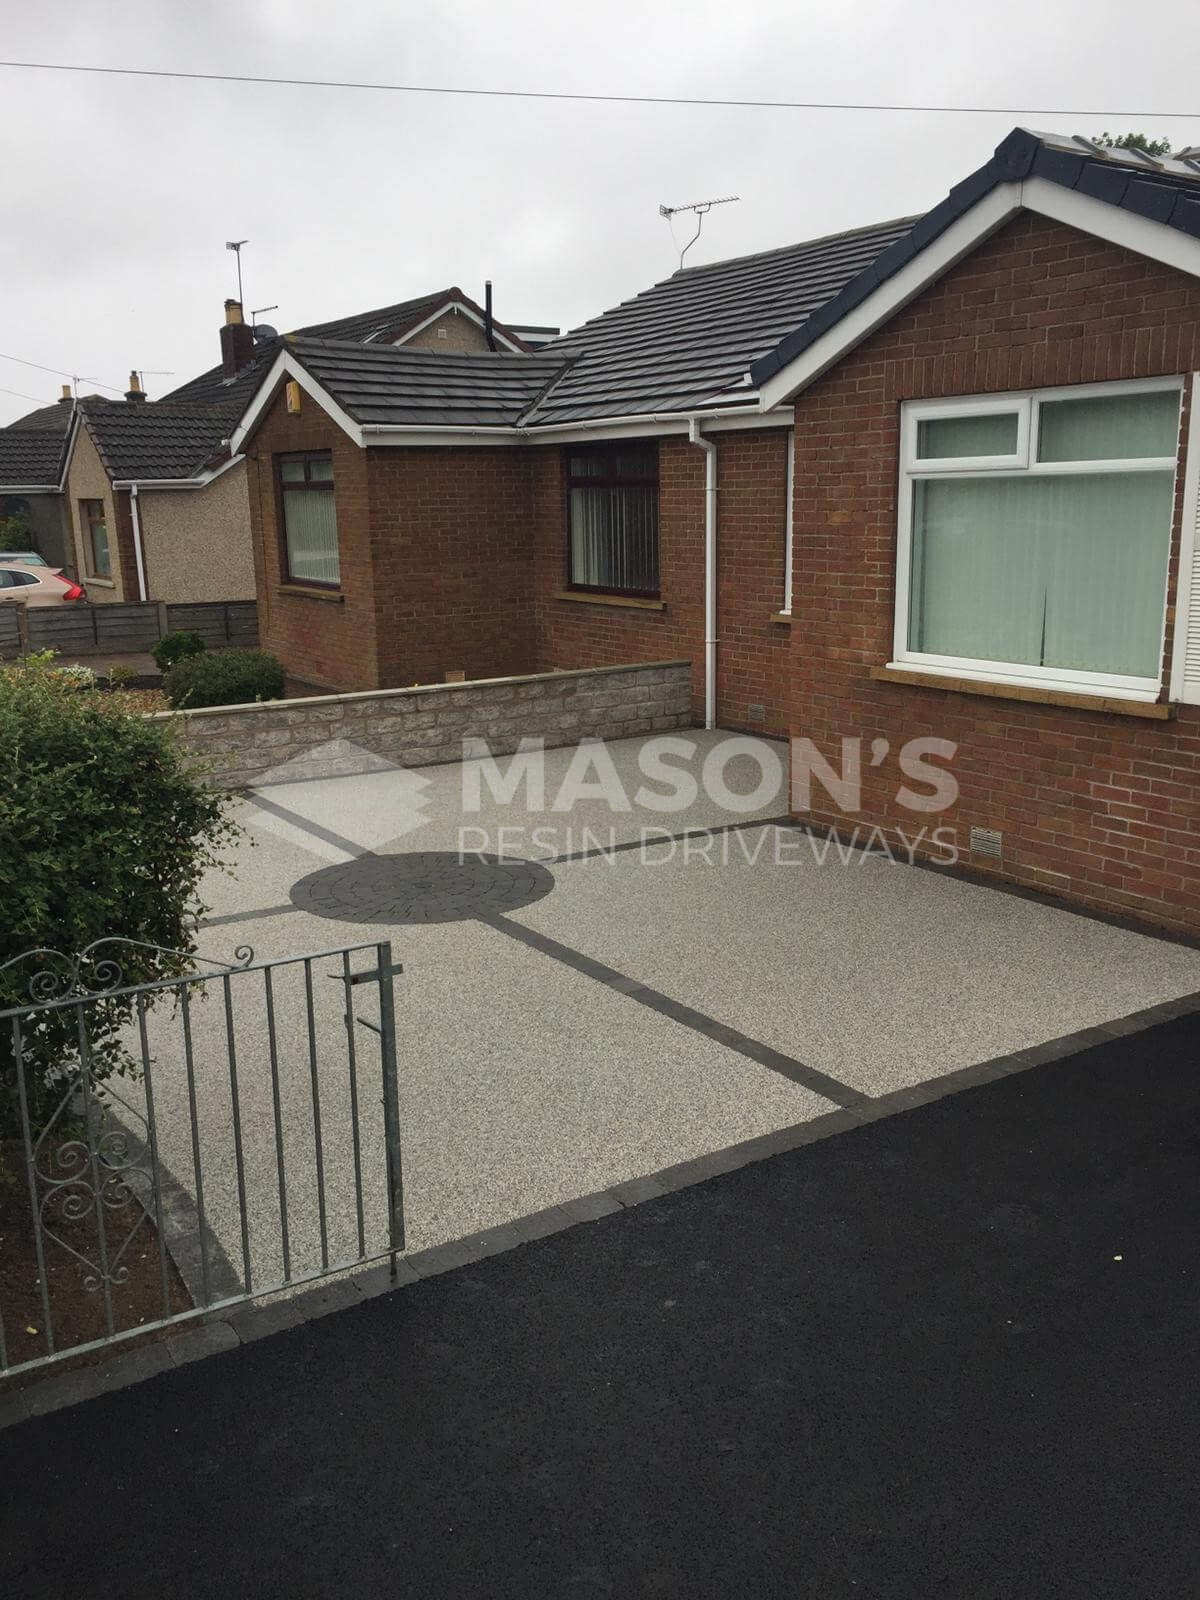 Silver quartz resin tarmac driveway portrait view in Preston, Lancashire